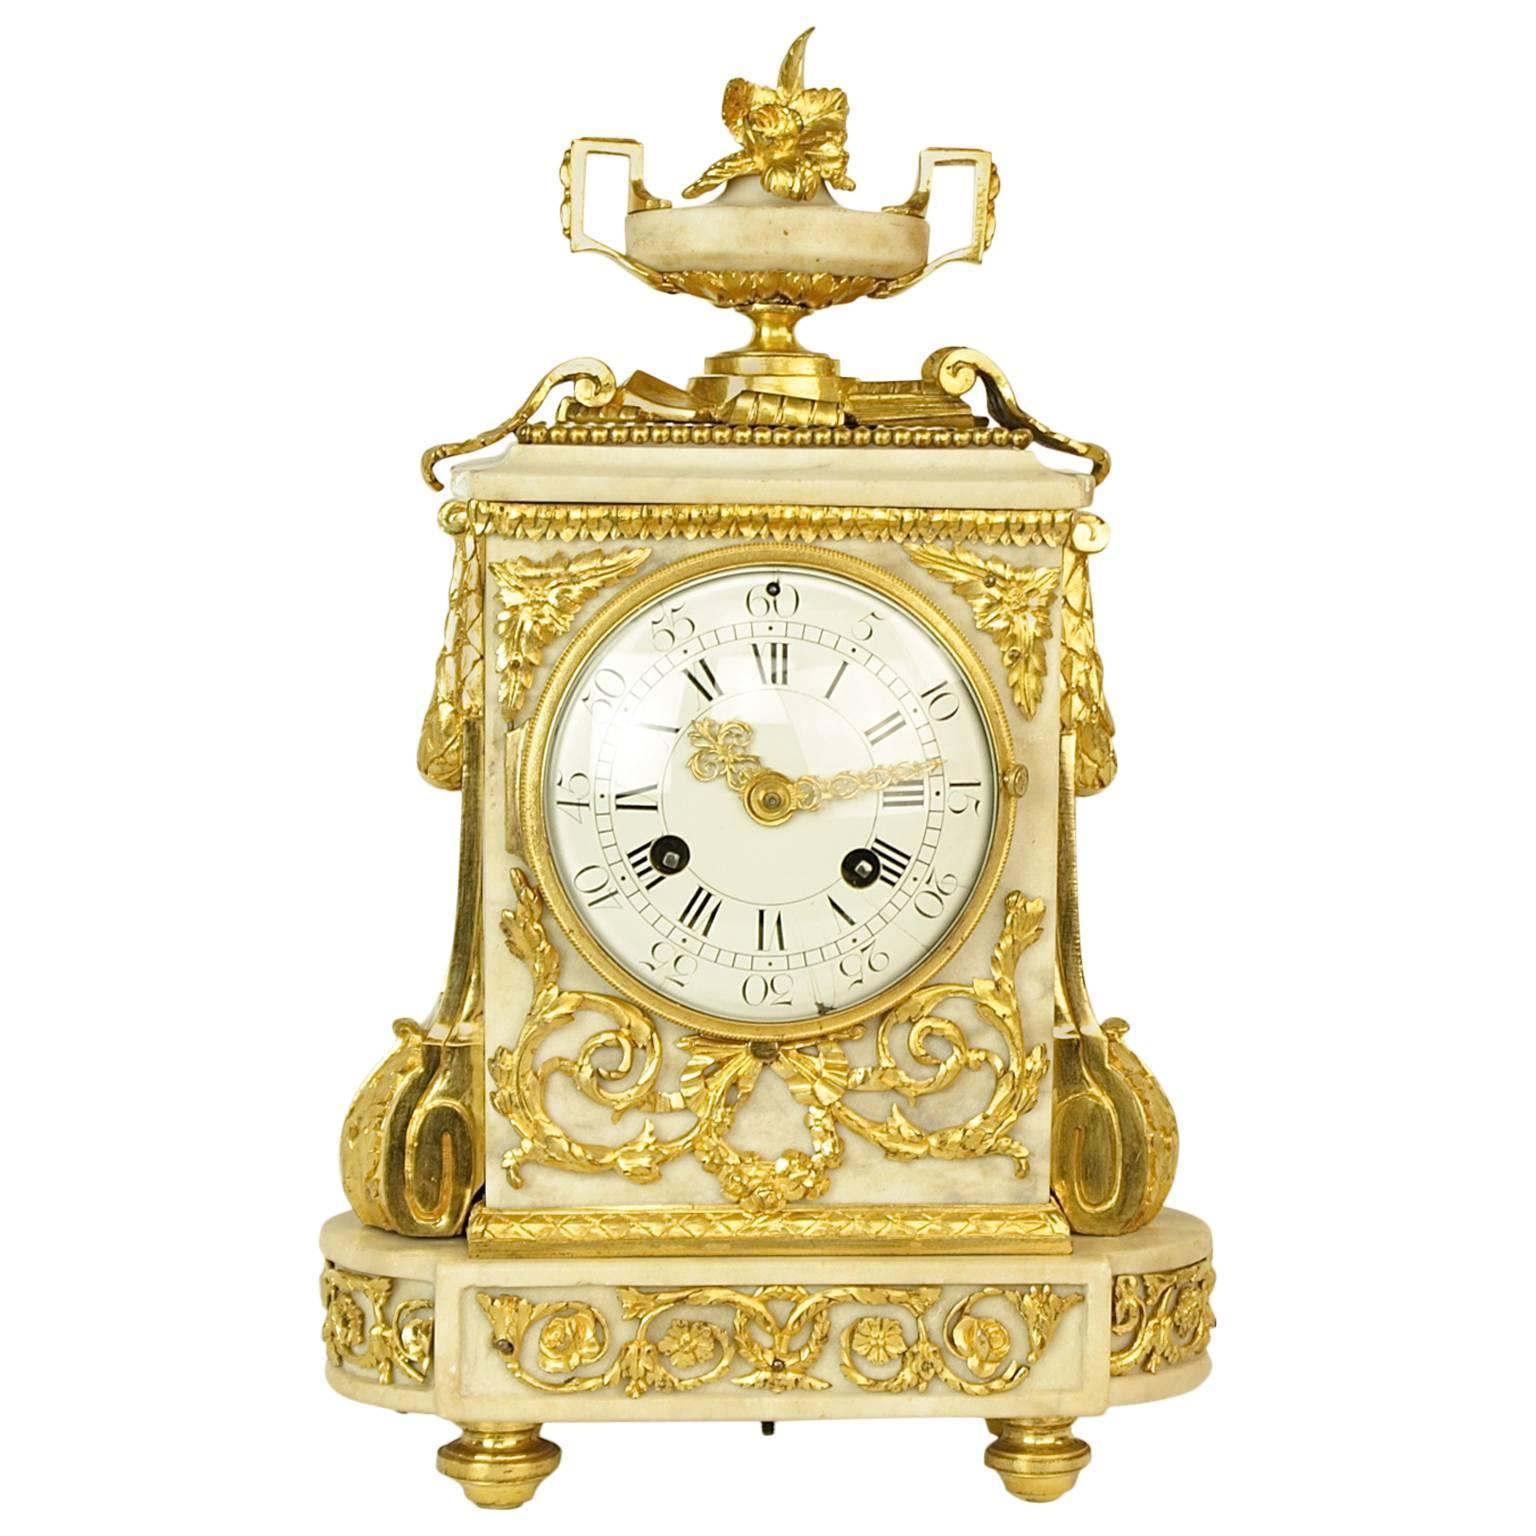 An 18th Century Louis XVI Gilt-Bronze and White Marble Mantel Clock, circa 1780